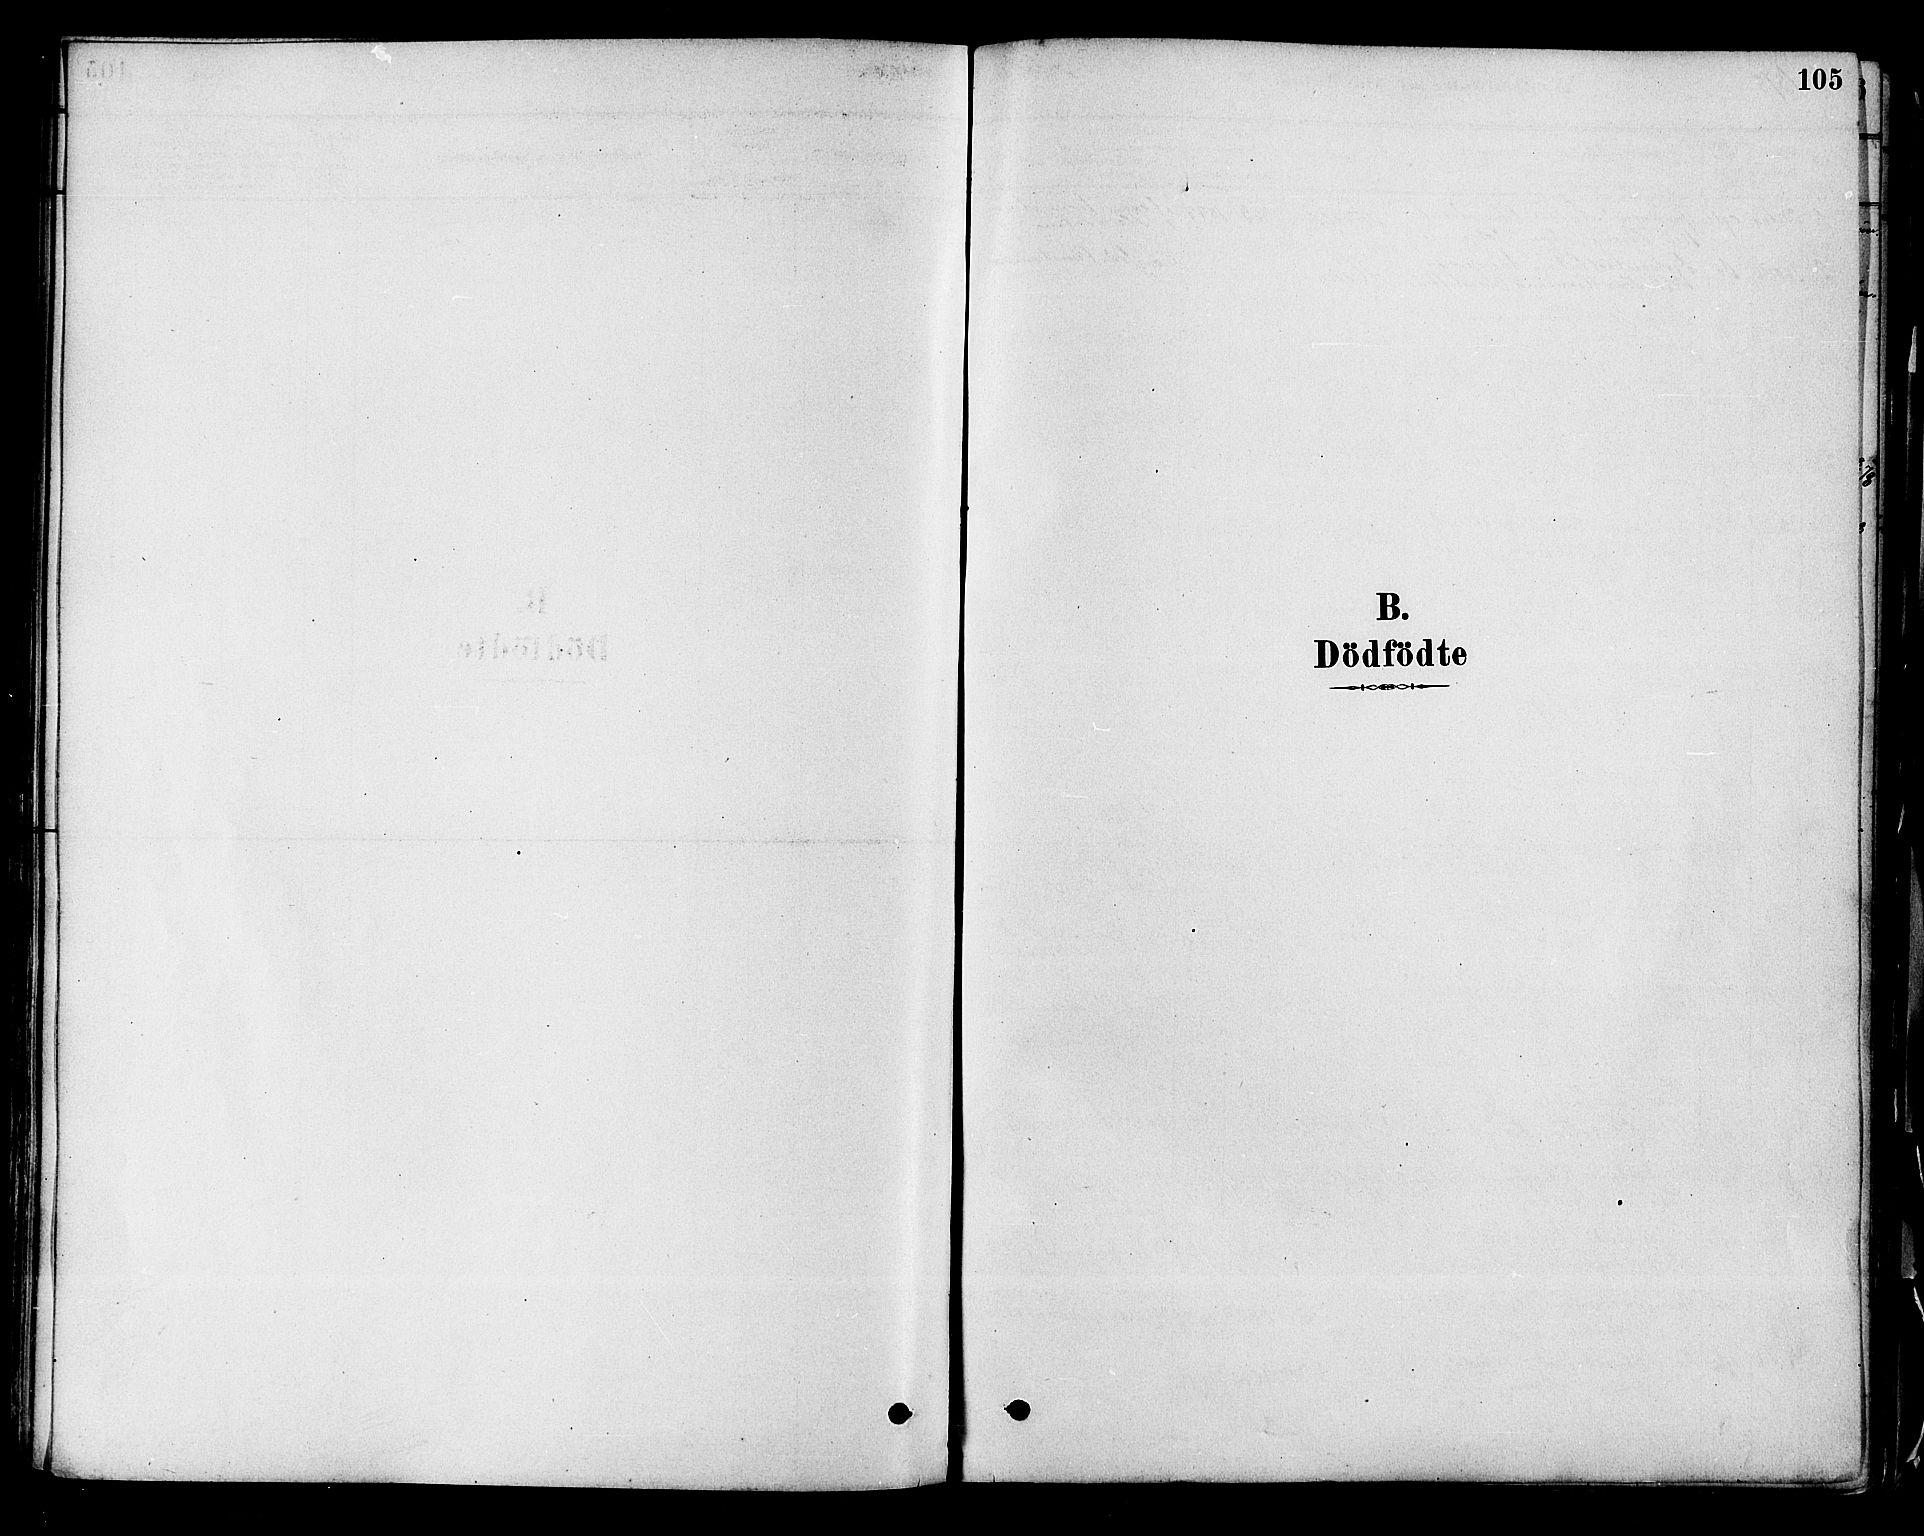 SAKO, Modum kirkebøker, F/Fa/L0011: Ministerialbok nr. 11, 1877-1889, s. 105